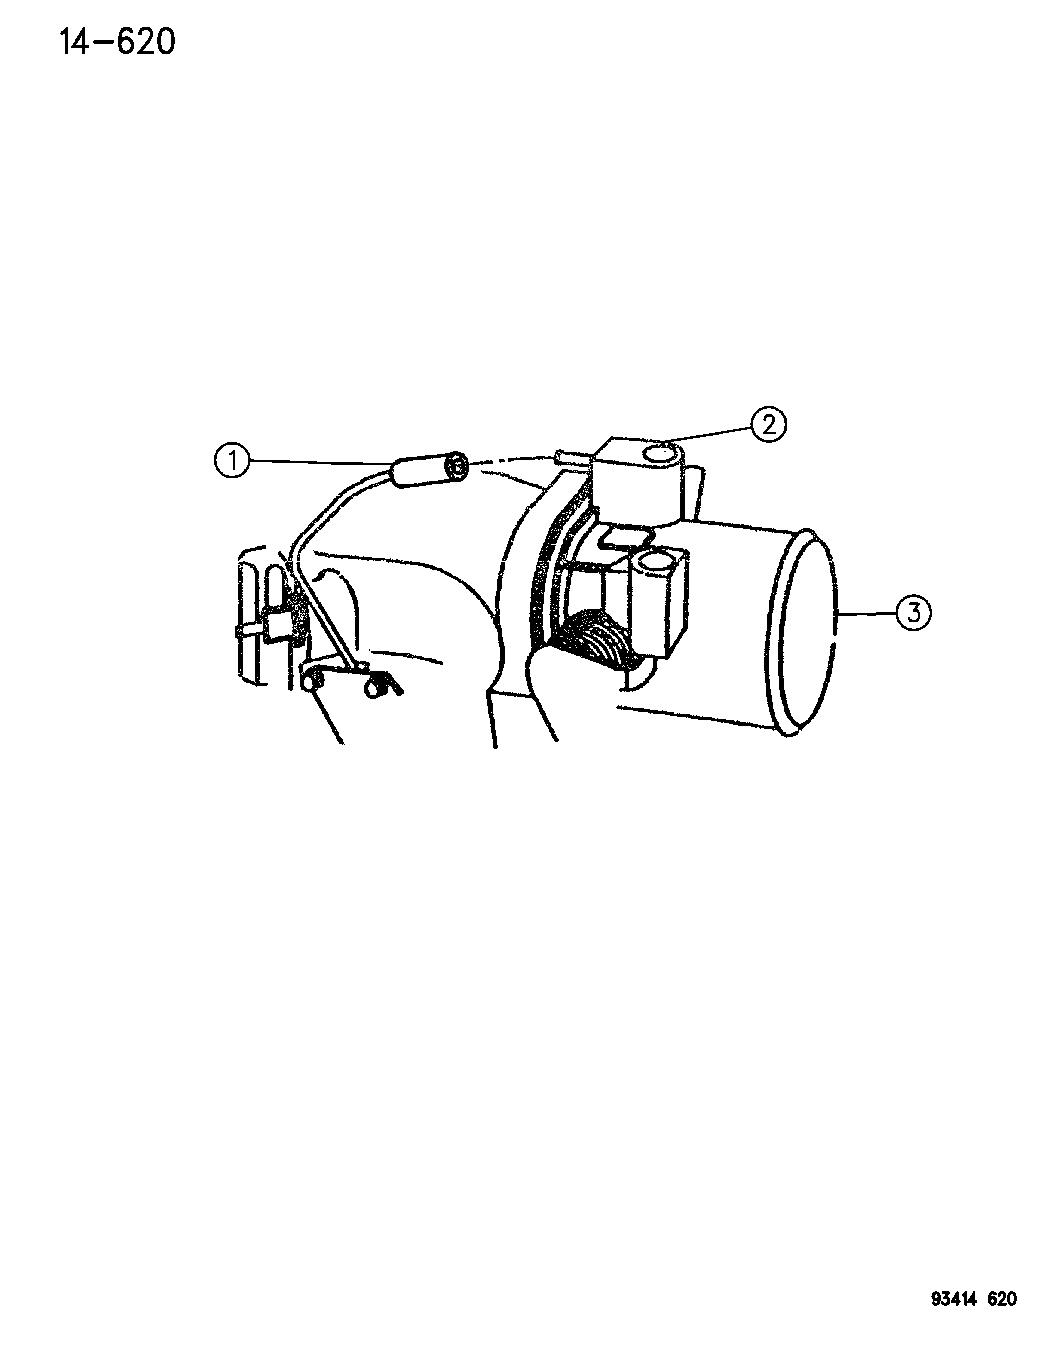 1993 Chrysler Concorde Throttle Body Mopar Parts Giant Wiring Diagram Thumbnail 2